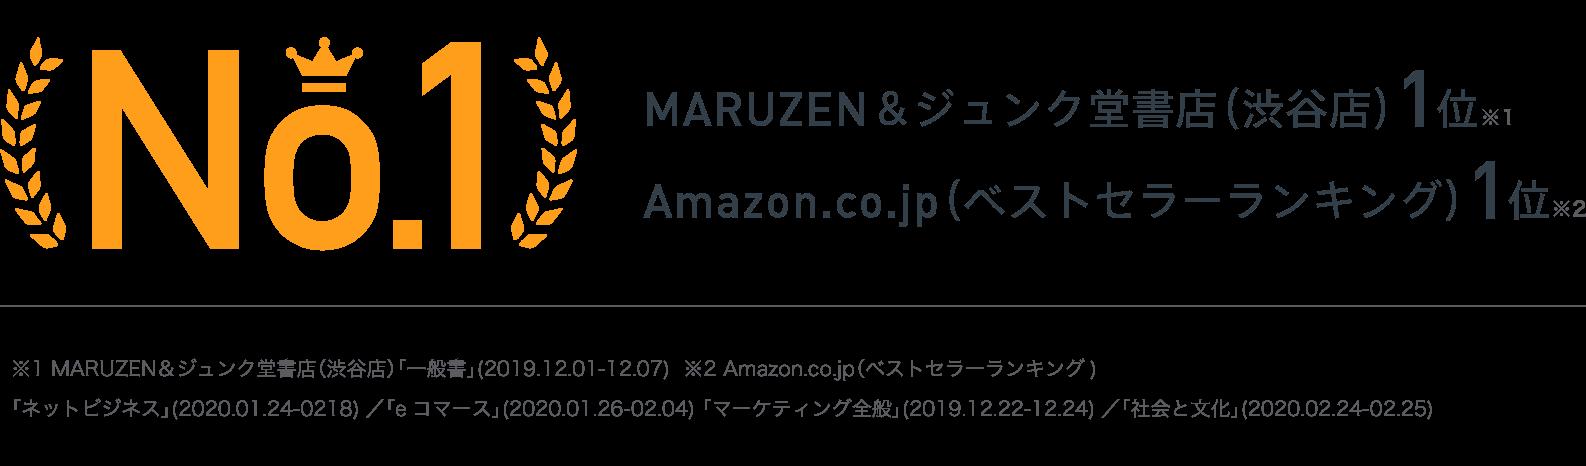 MARUZEN&ジュンク堂書店(渋谷店)1位 Amazon.co.jp(ベストセラーランキング)1位